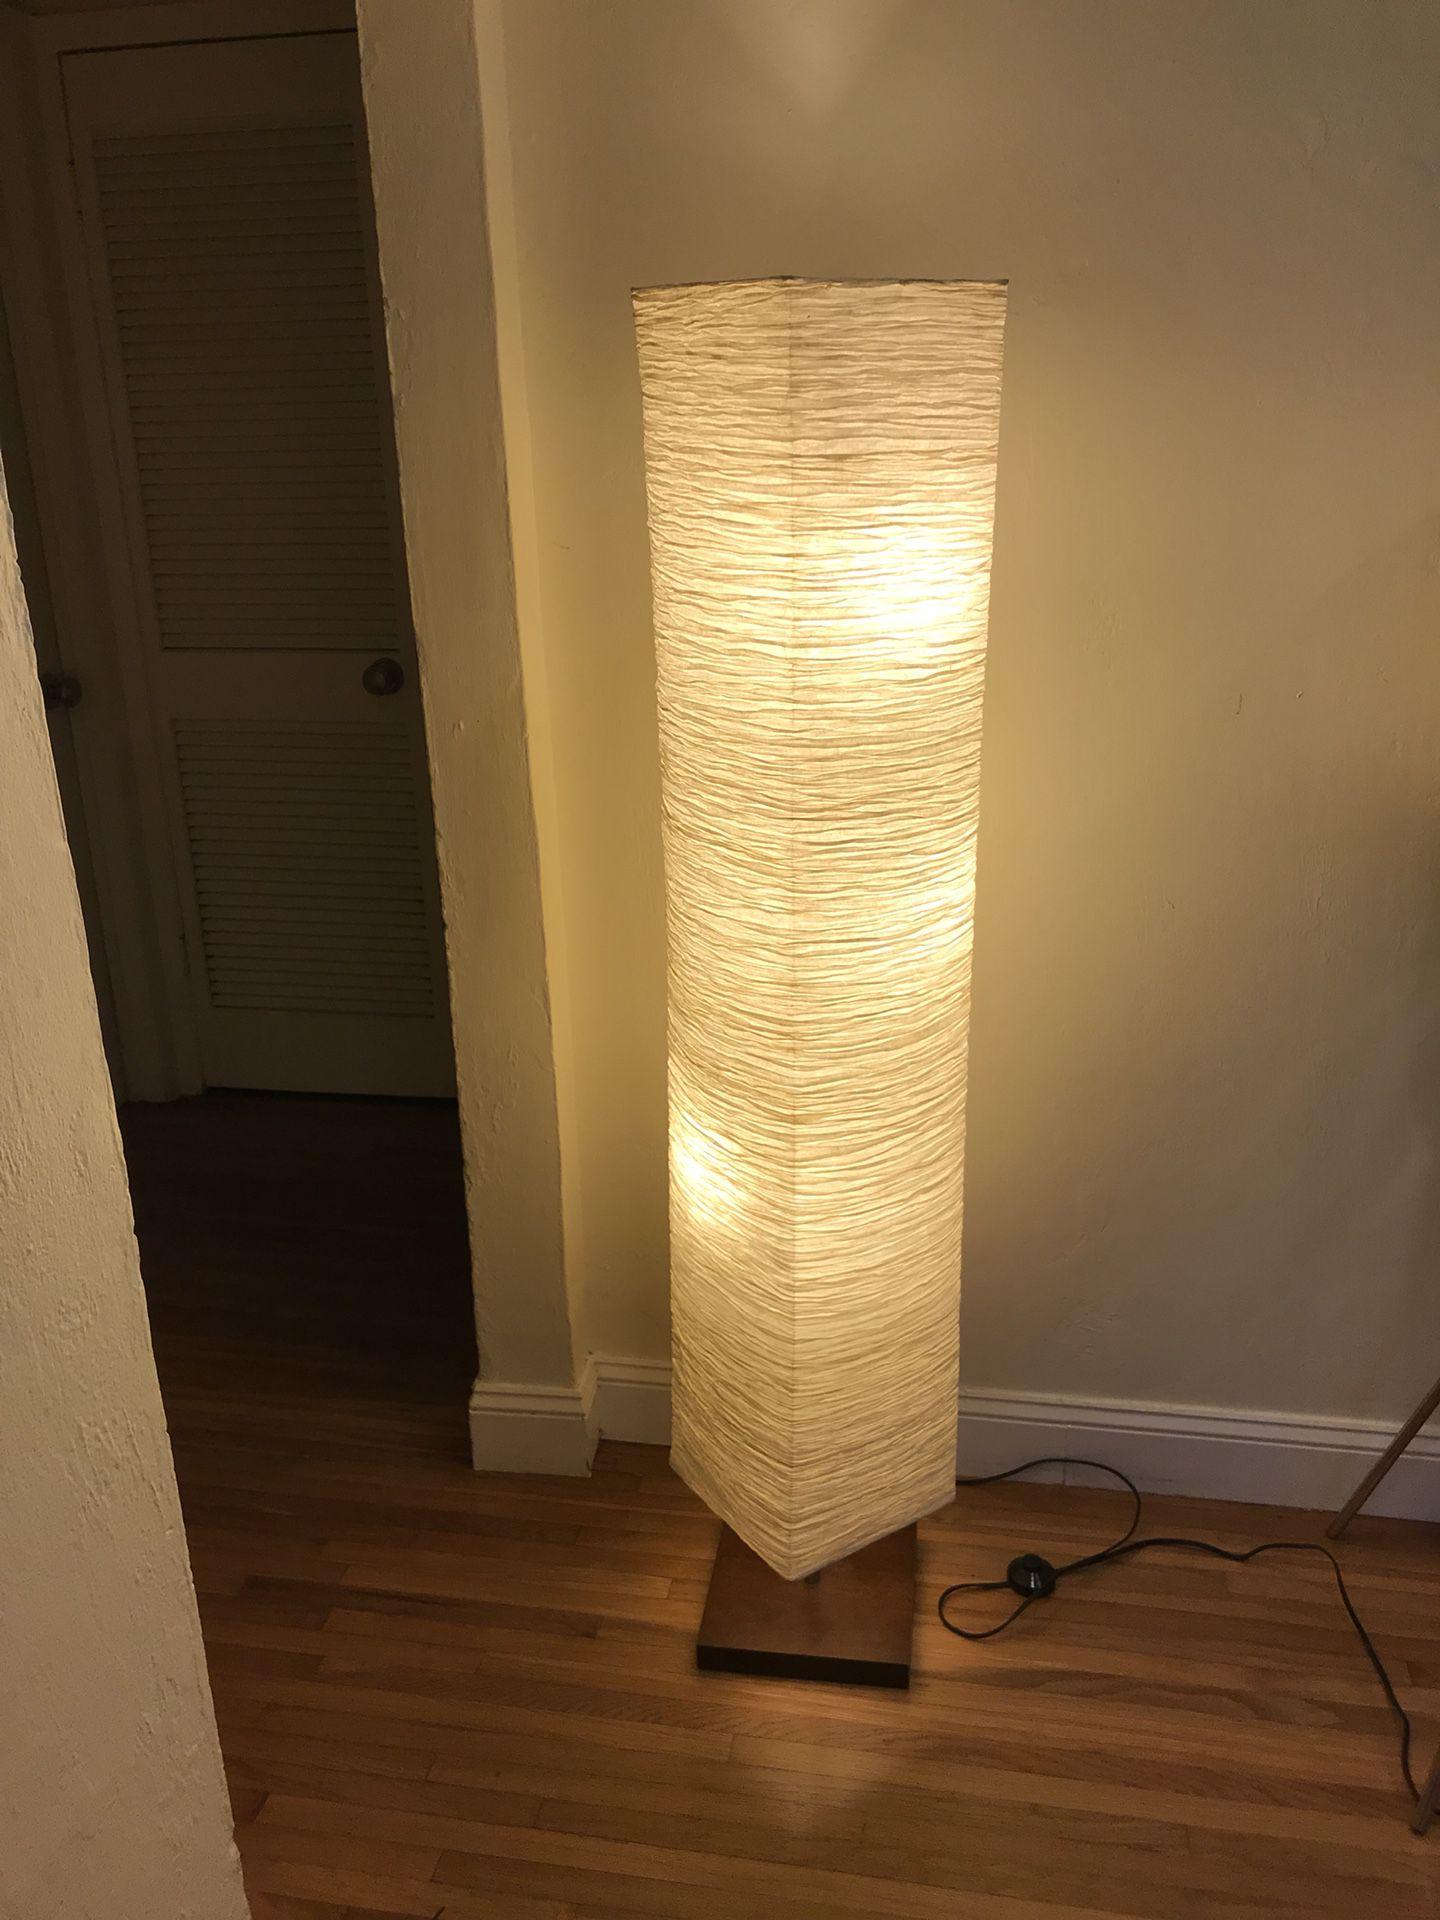 Floor lamp with three light bulbs